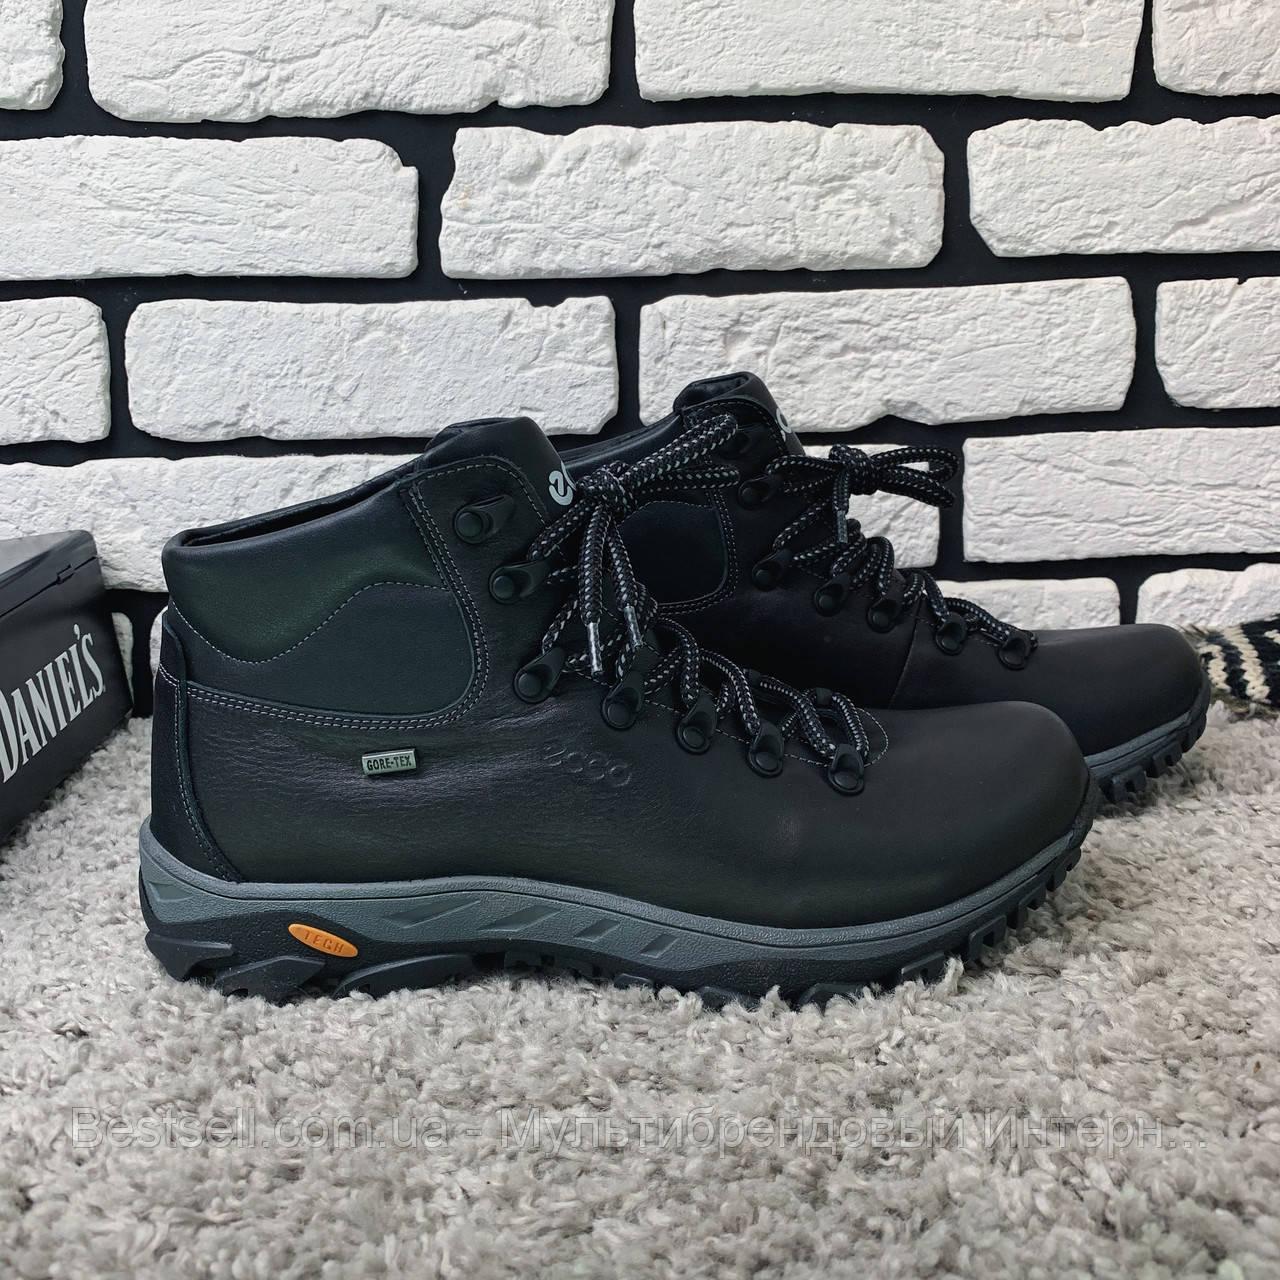 Зимние ботинки (на меху) ECCO  13040 ⏩ [ 43 последний размер ]